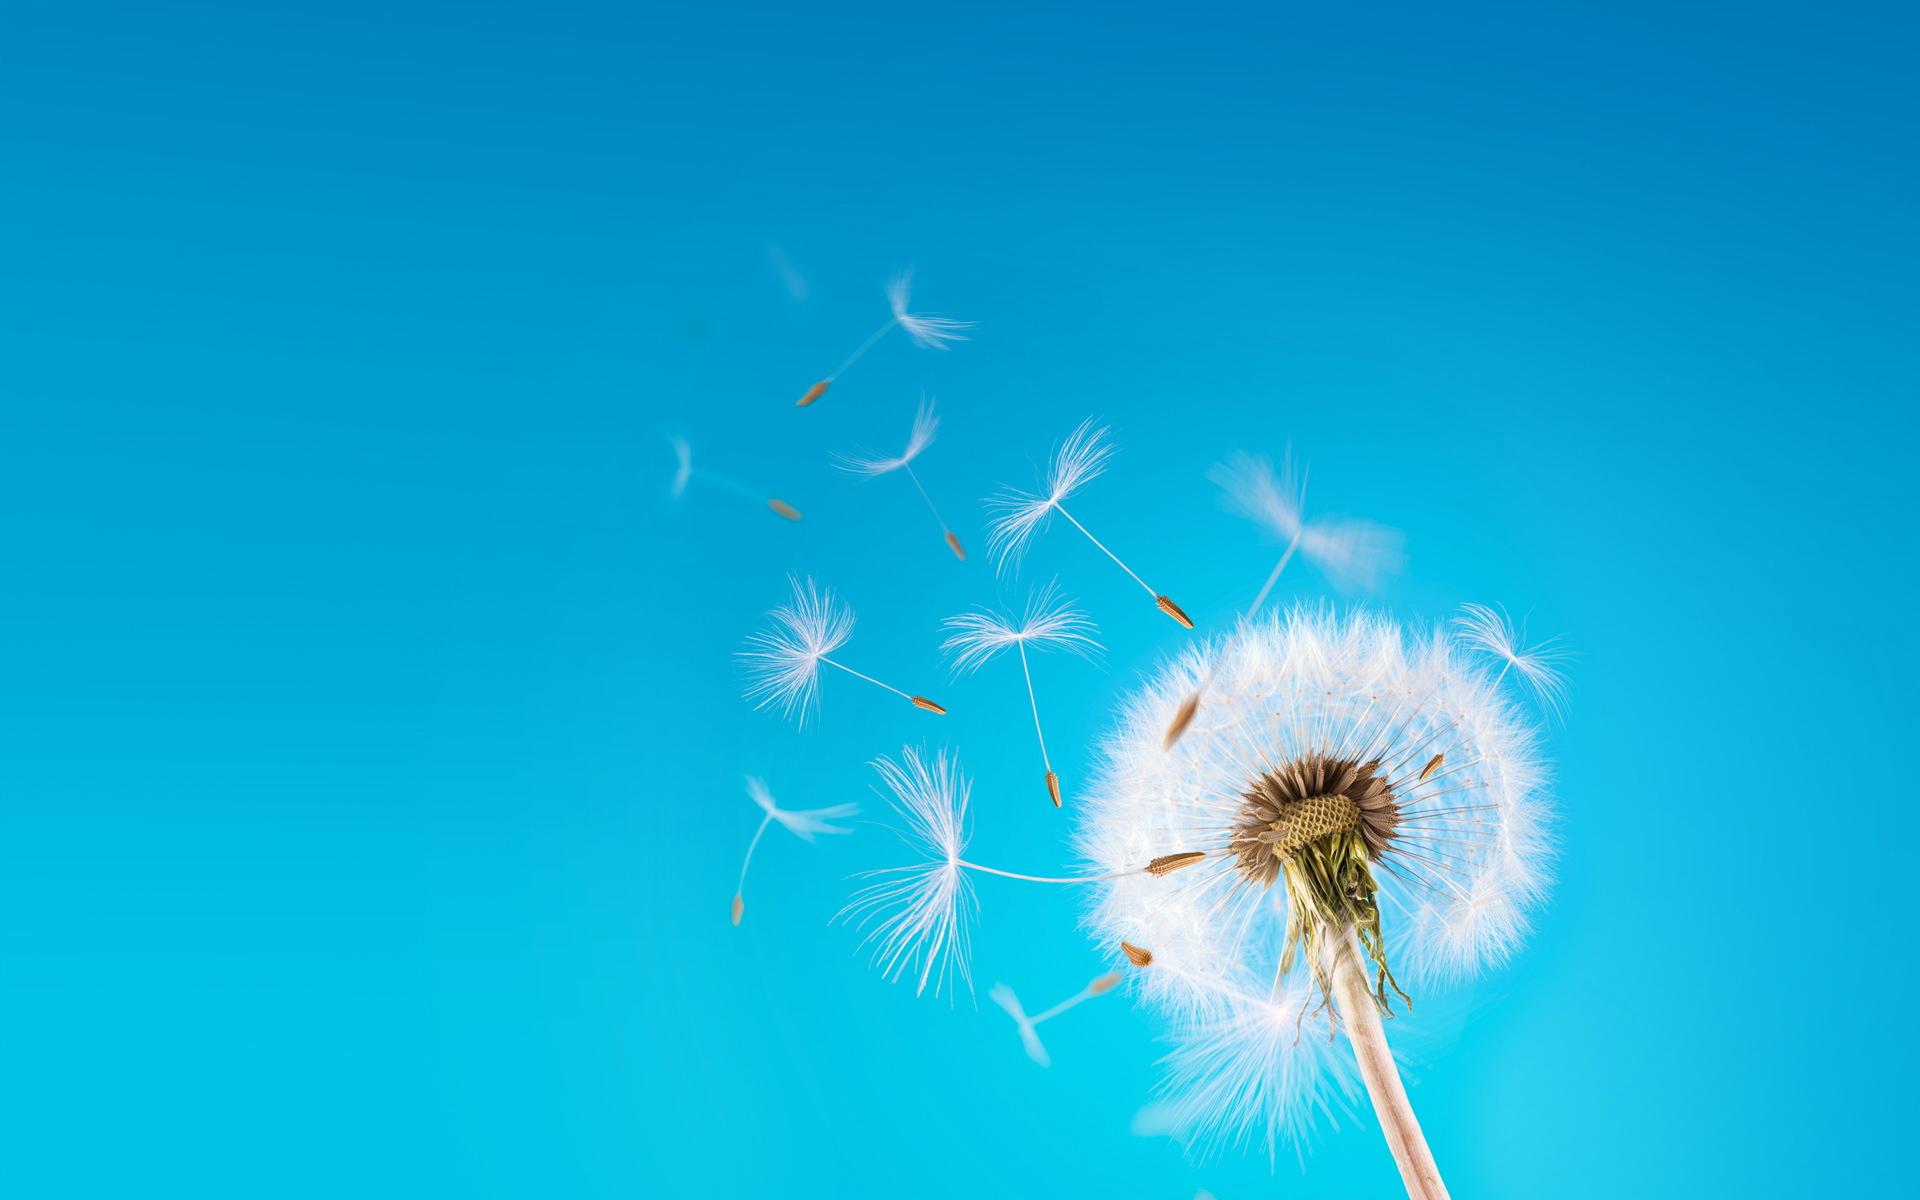 flying dandelion seeds wallpaper 42644